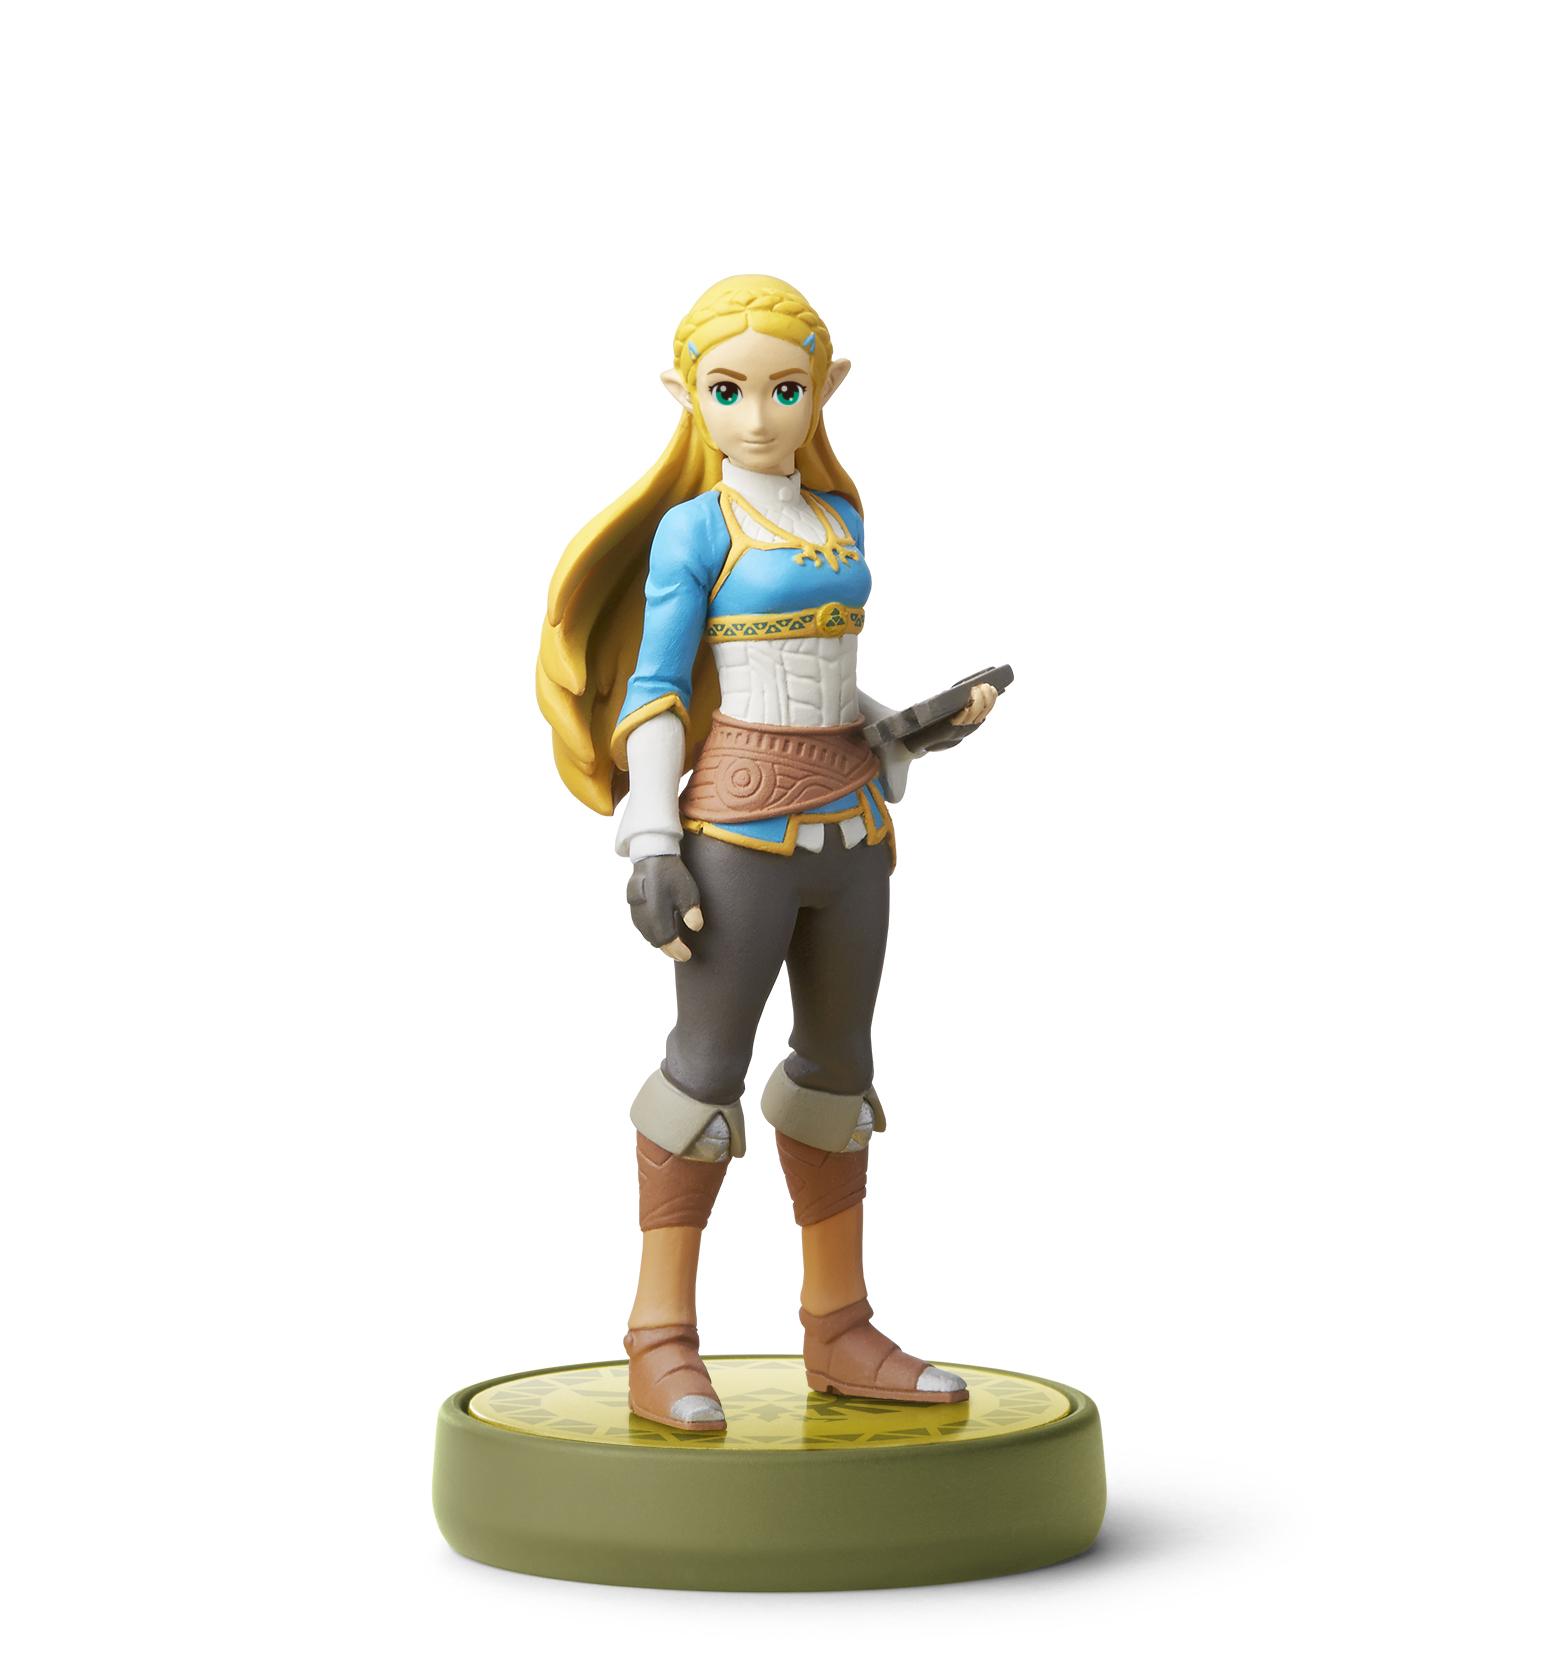 The Legend of Zelda: Breath of the Wild image 50